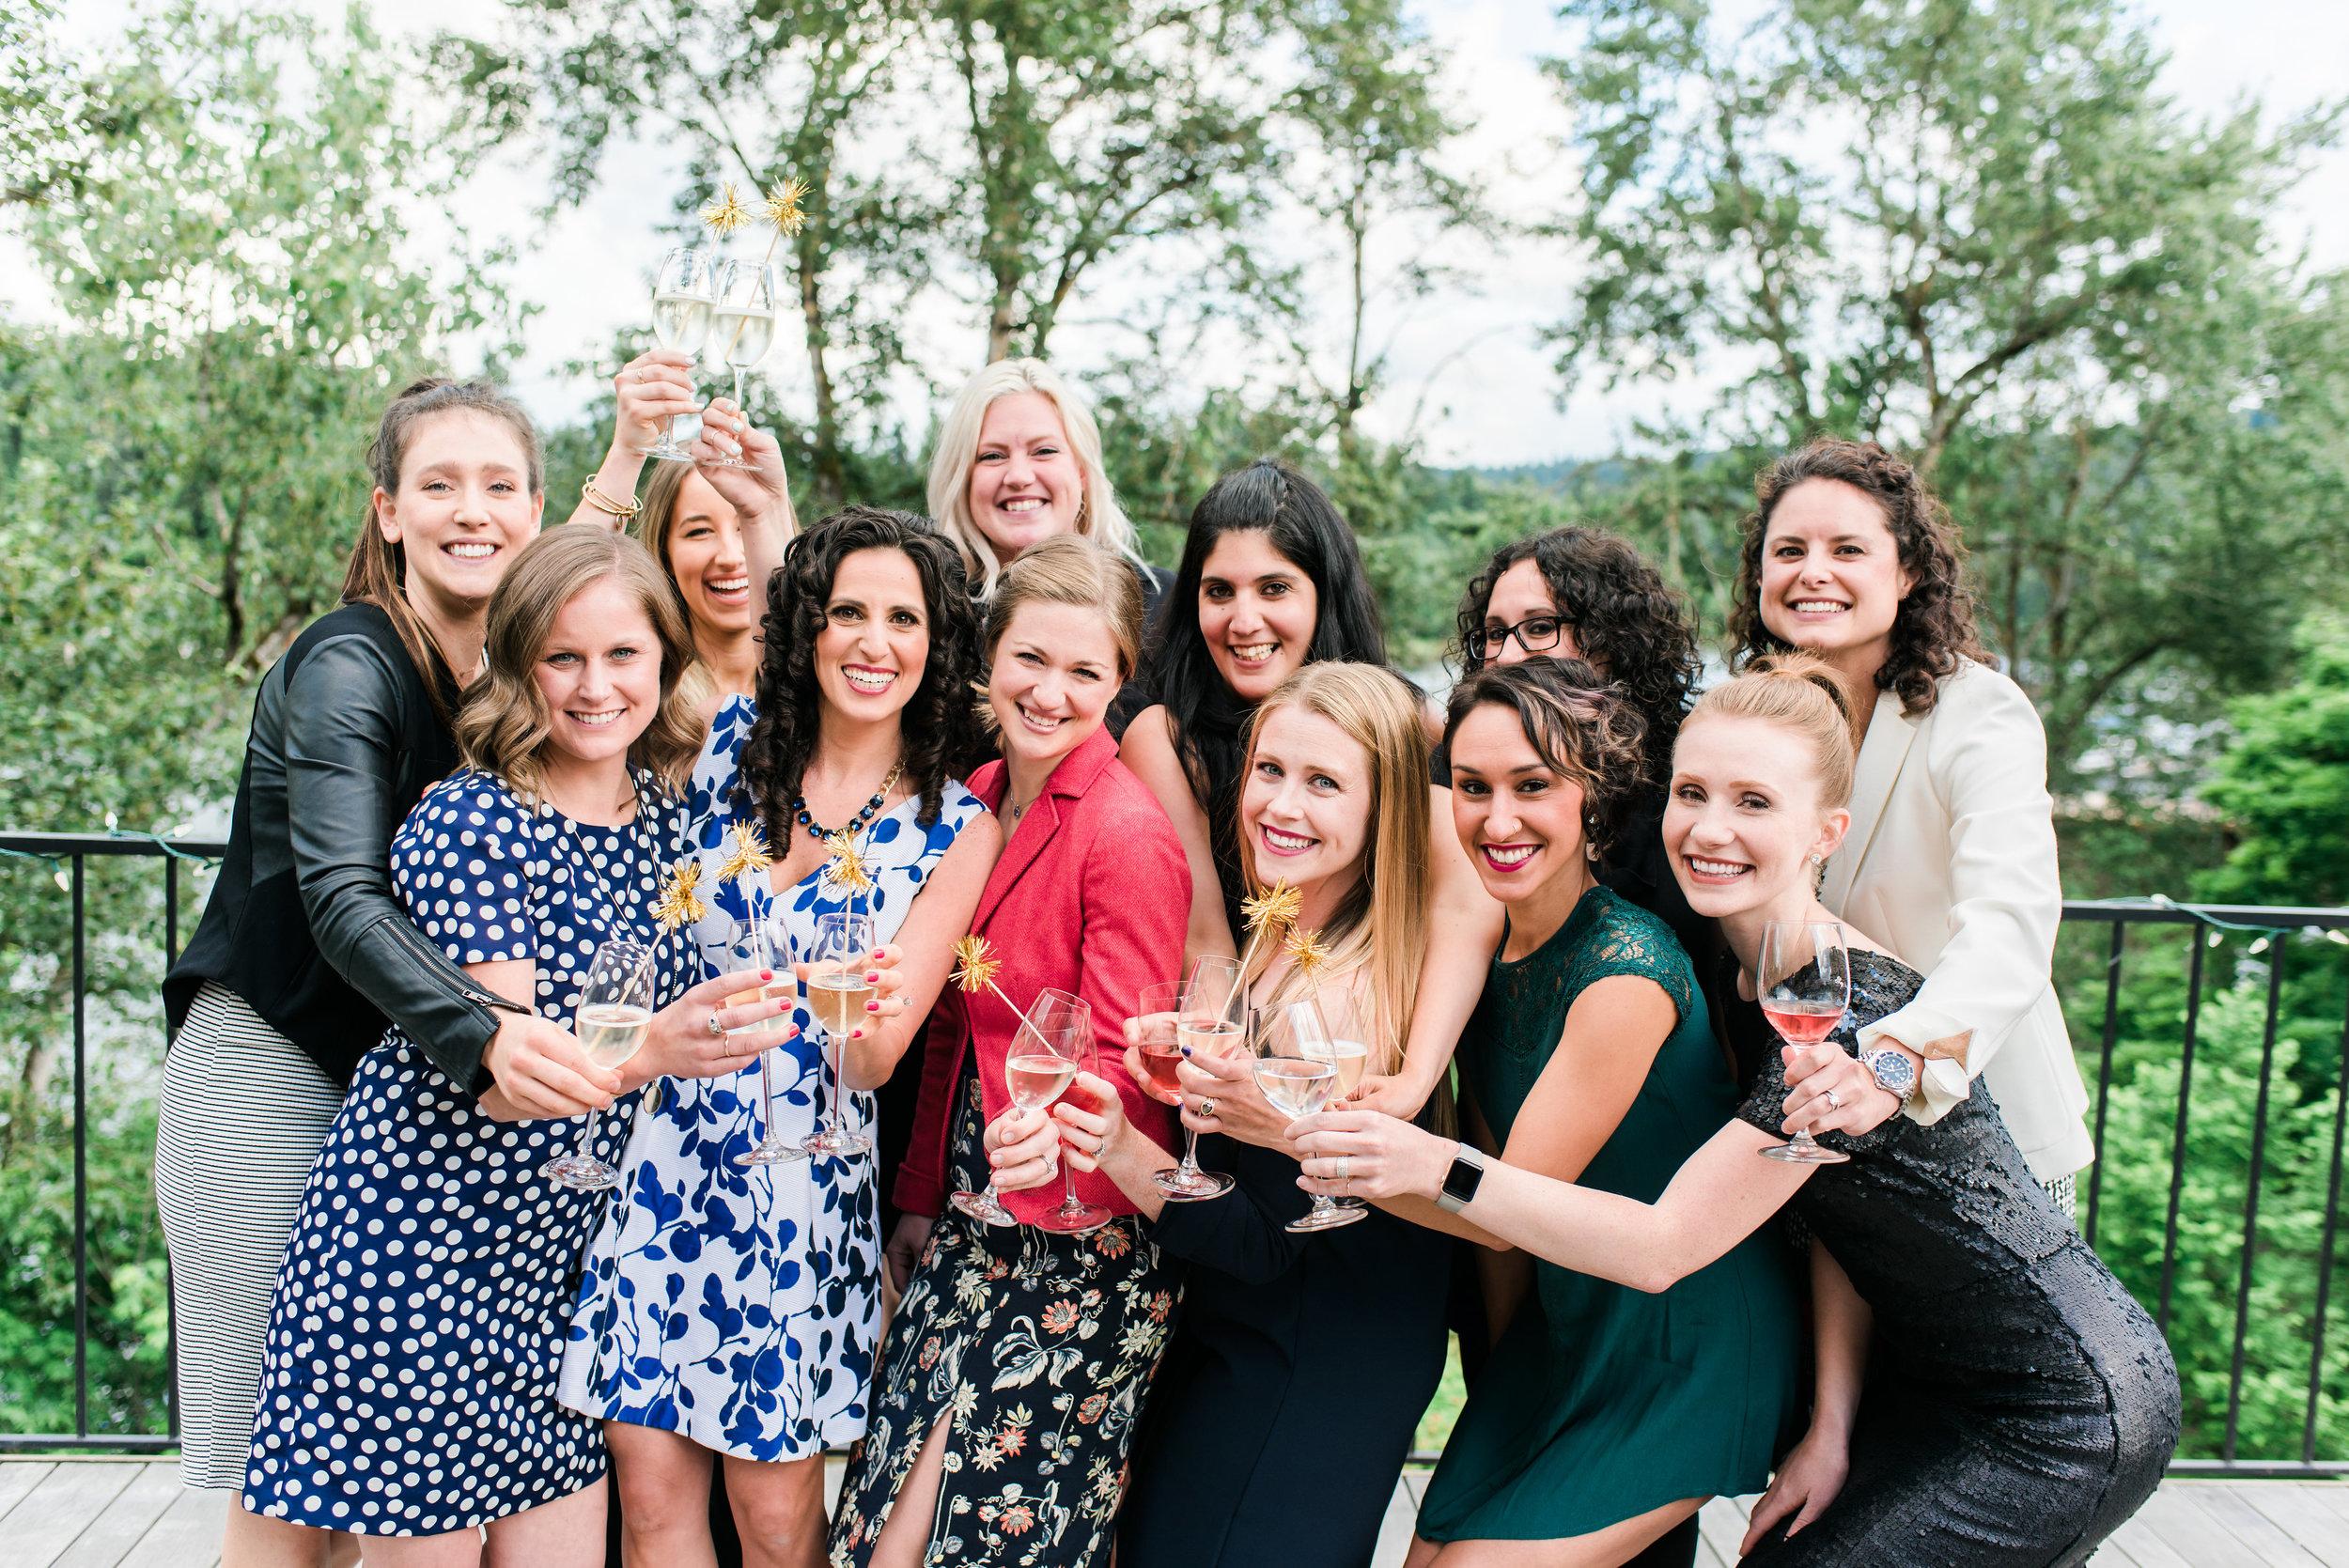 Bridalbliss.com | Portland Seattle Bend Wedding Planning | Oregon Washington Event Design | Deyla Huss Photography